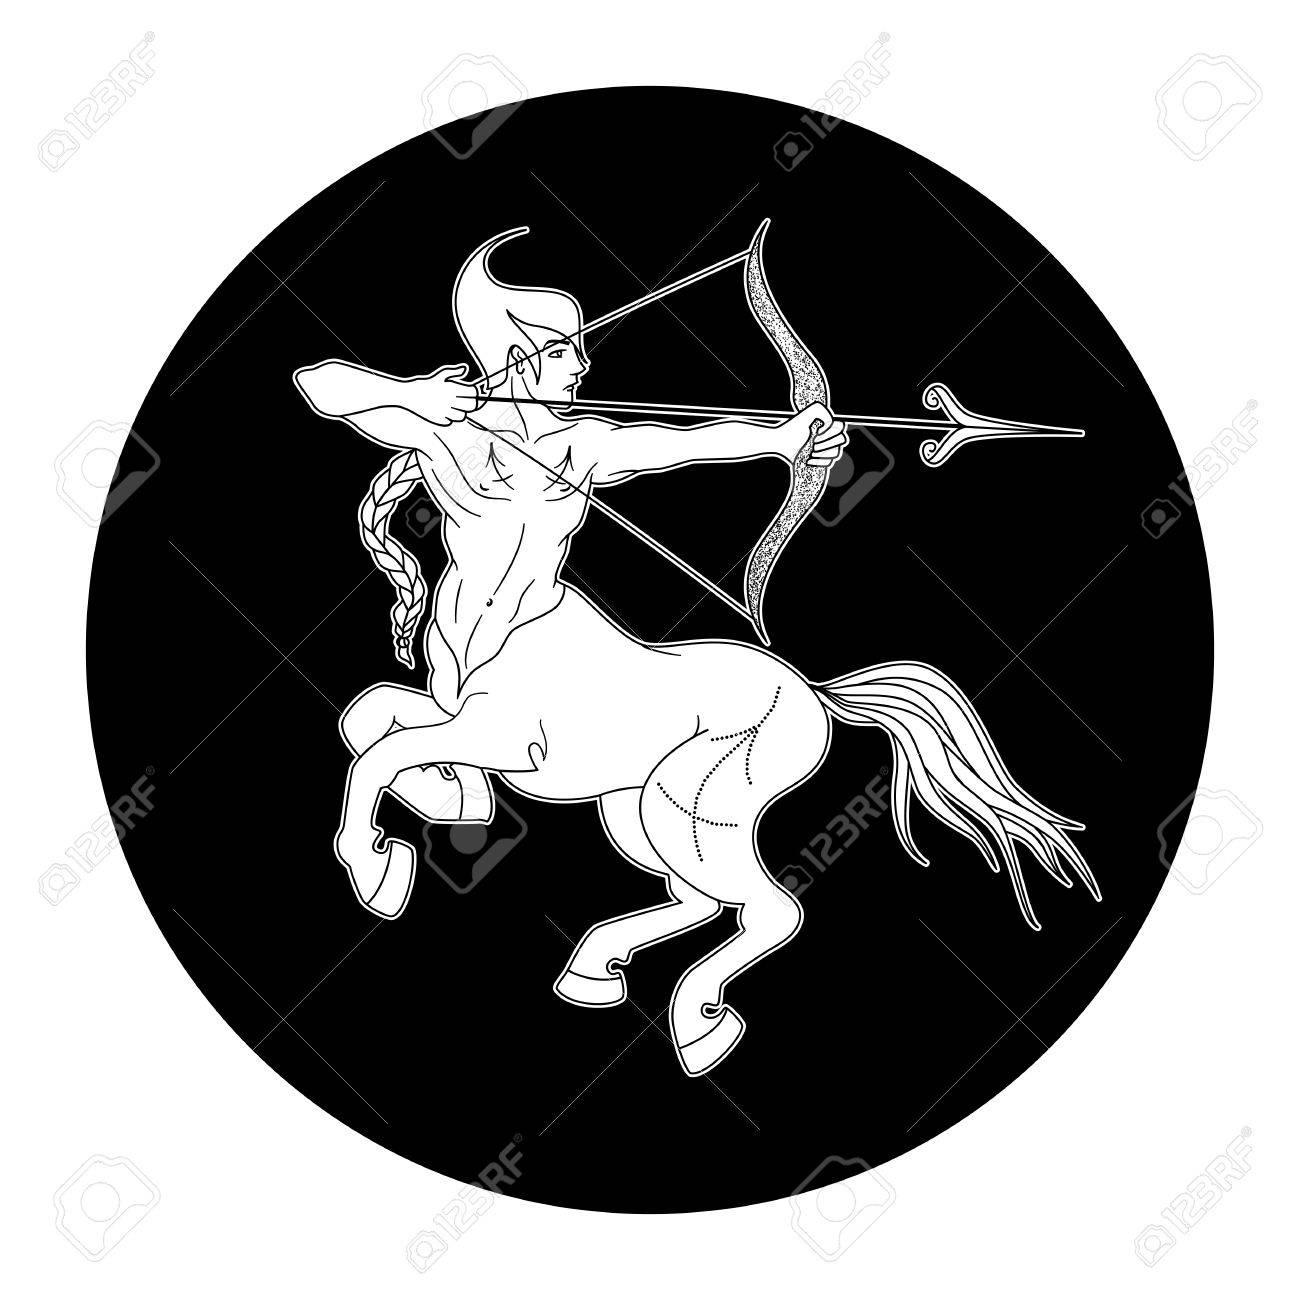 sagittariuss horoscope symbol